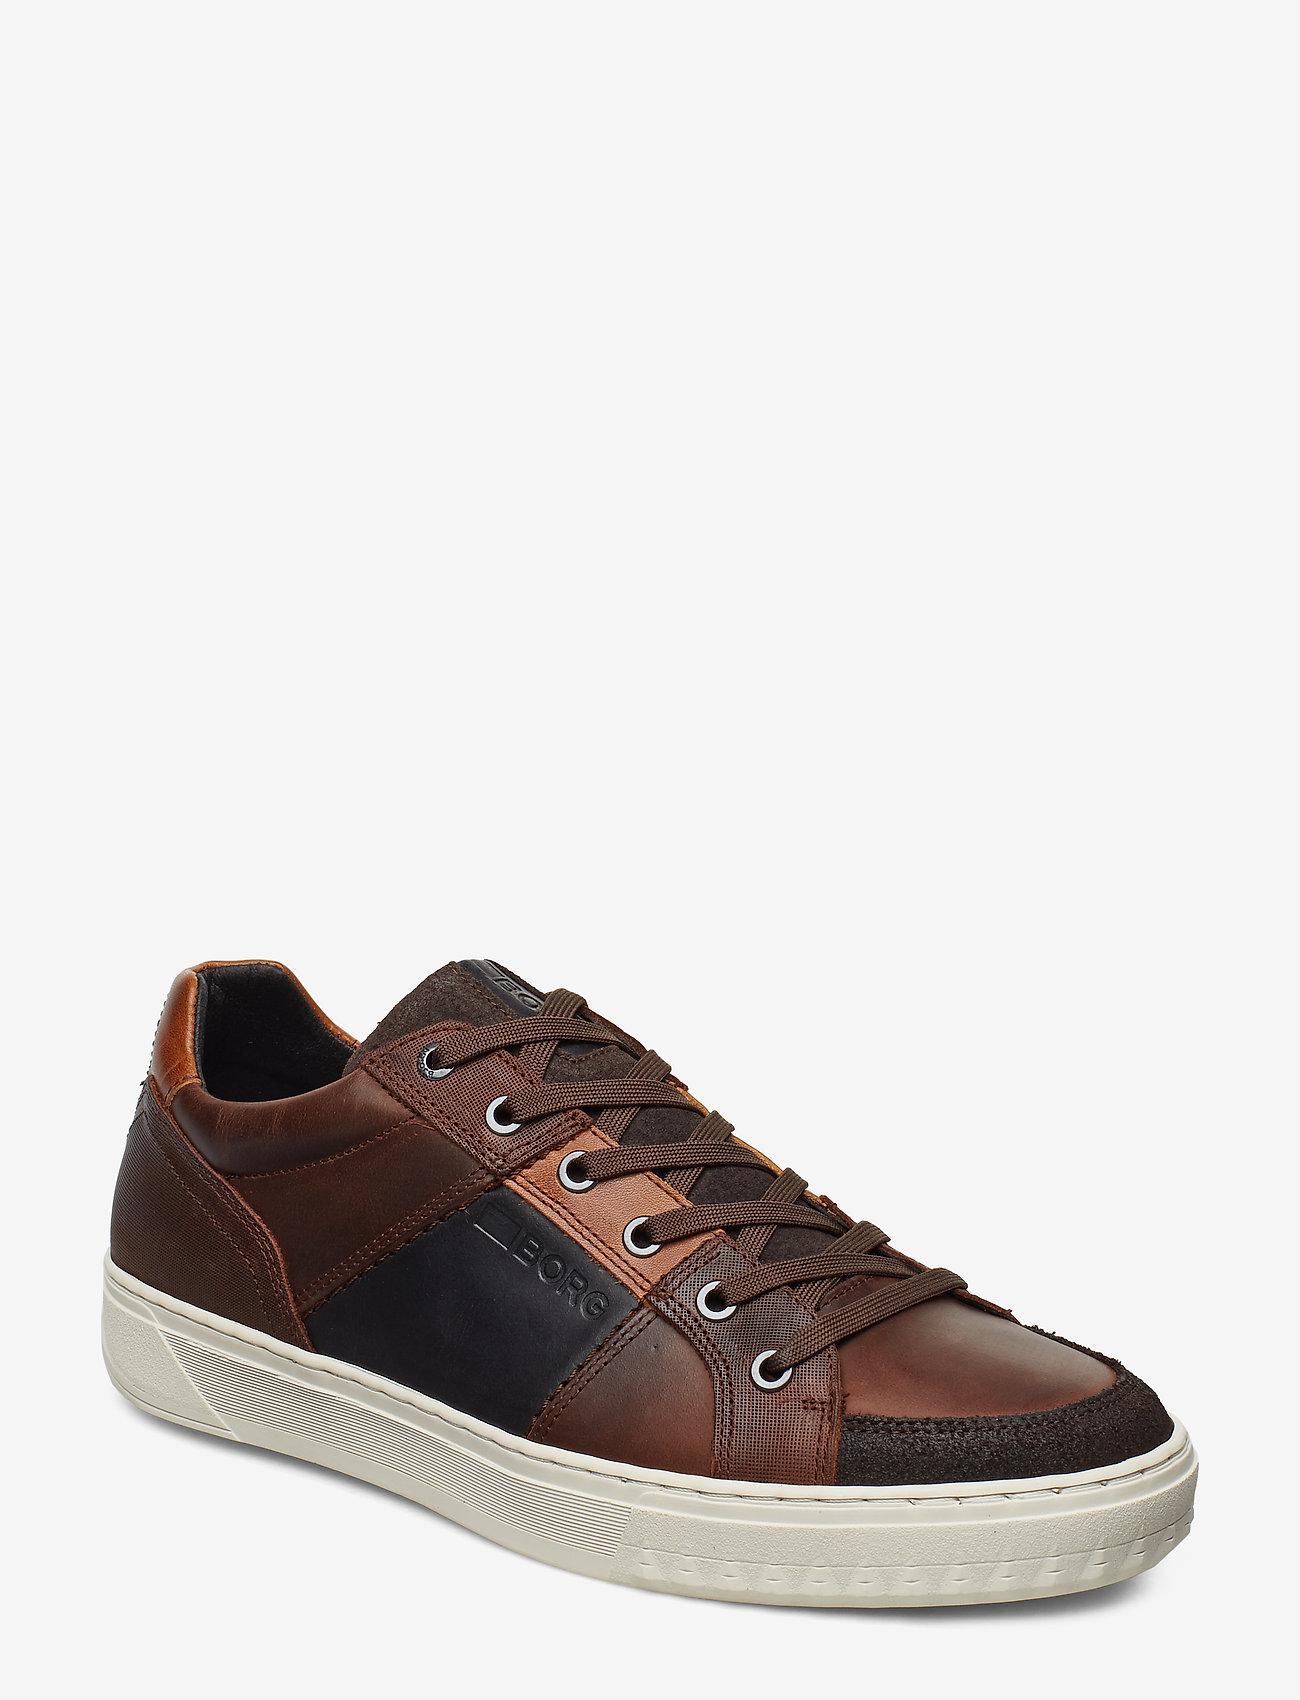 Björn Borg - COLLIN LOW DMT M - laag sneakers - dark brown - 0